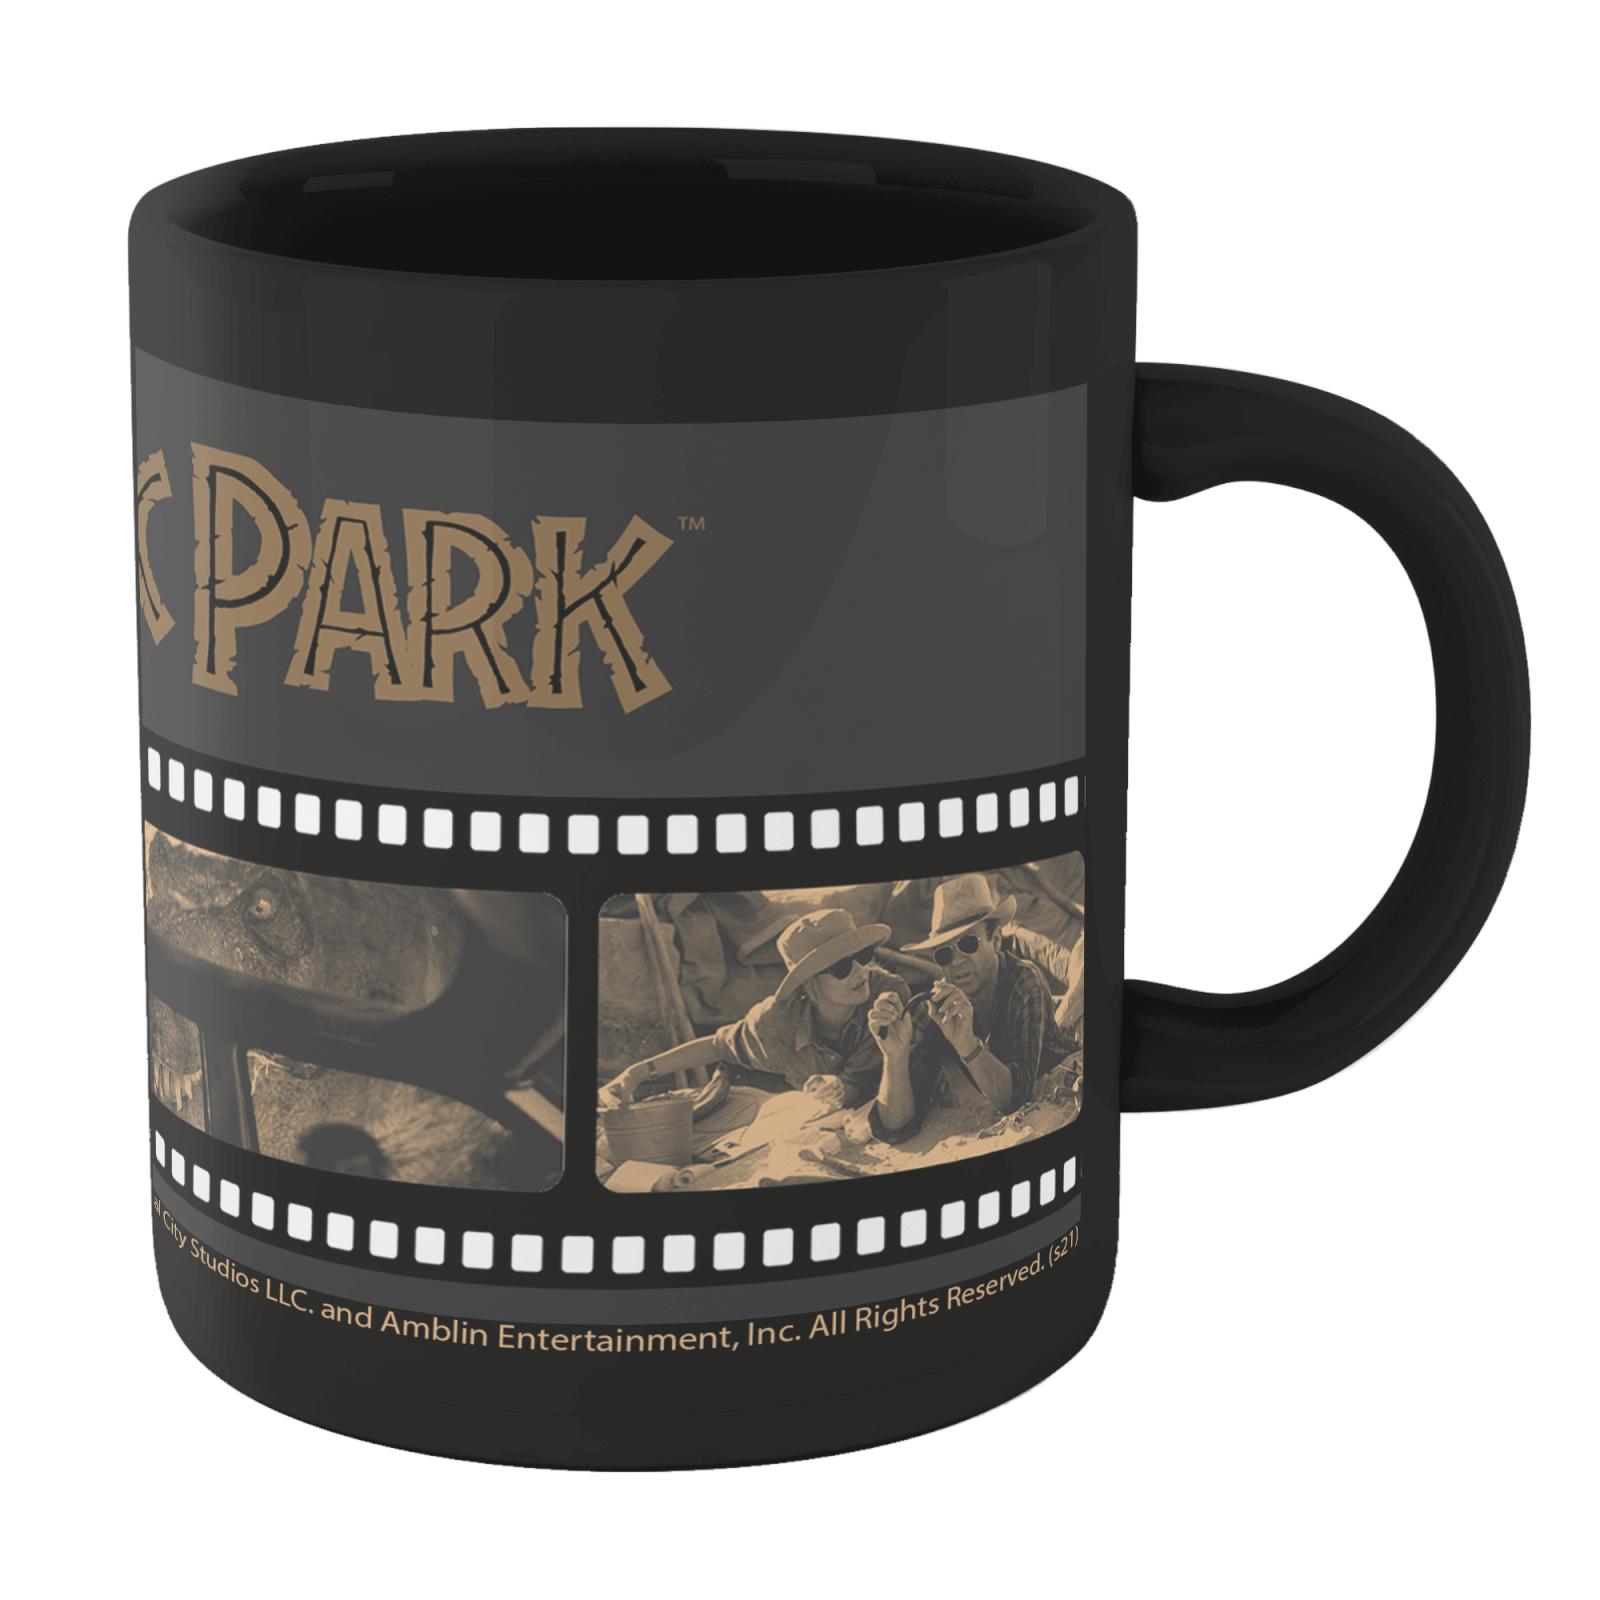 Jurassic Park Film Reel Mug - Black